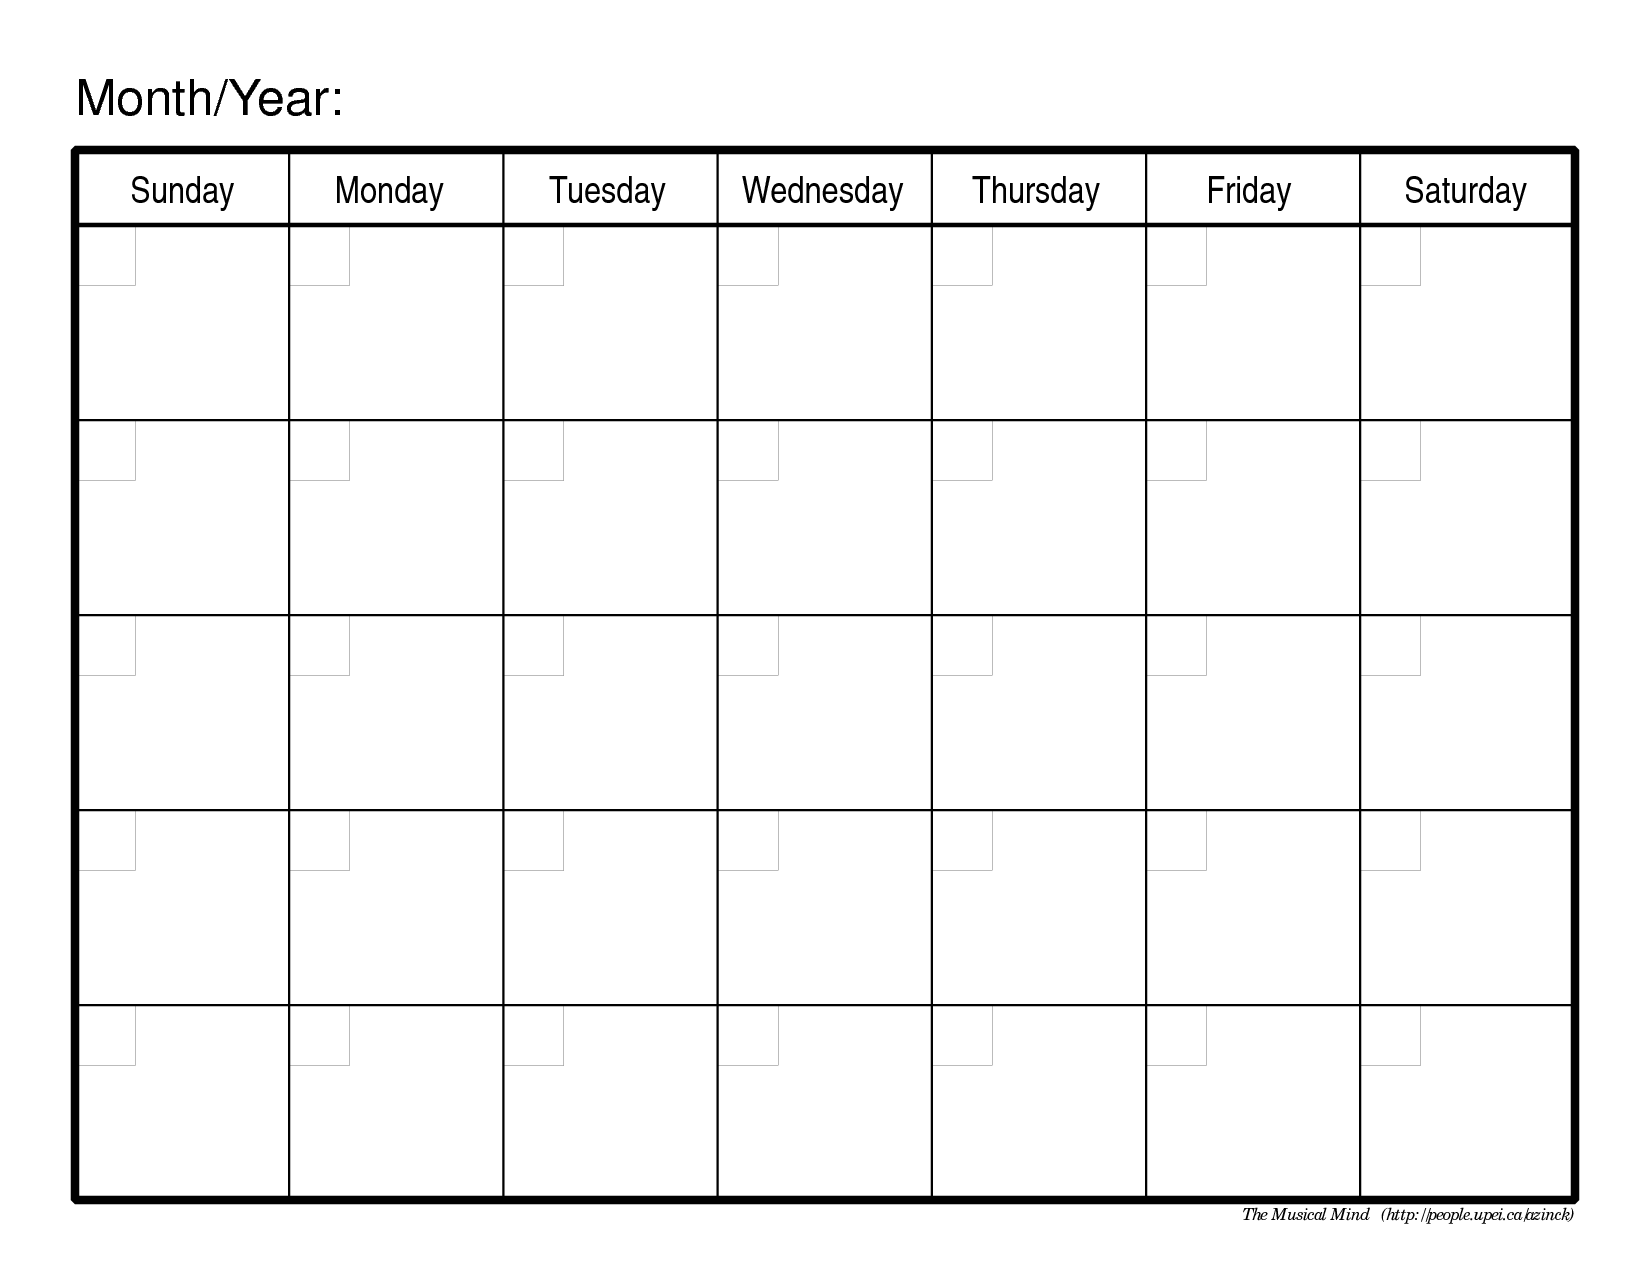 Microsoft Office Weekly Calendar Template. excel calendar 2015 (uk